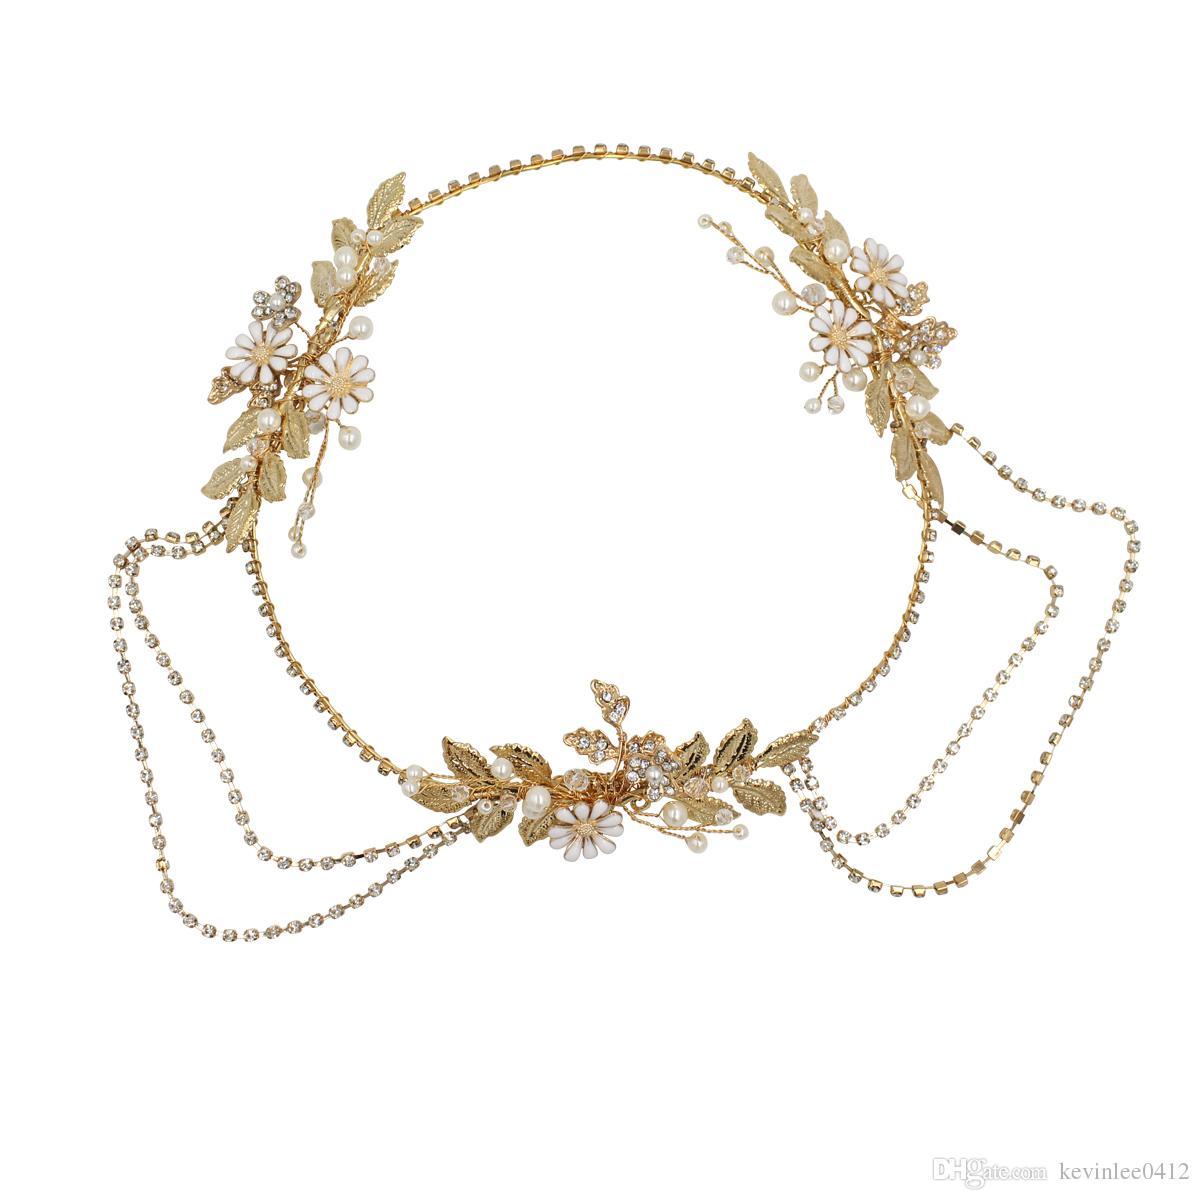 https://www.dhresource.com/0x0s/f2-albu-g9-M01-E2-F8-rBVaVV0Ehm6AeC5pAAZReyr4yA8076.jpg/vintage-gold-rhinestone-flower-chain-headpiece-wedding-hair-accessories-special-occasion-headbands-bridal-tiara-crown-chinese-headband.jpg